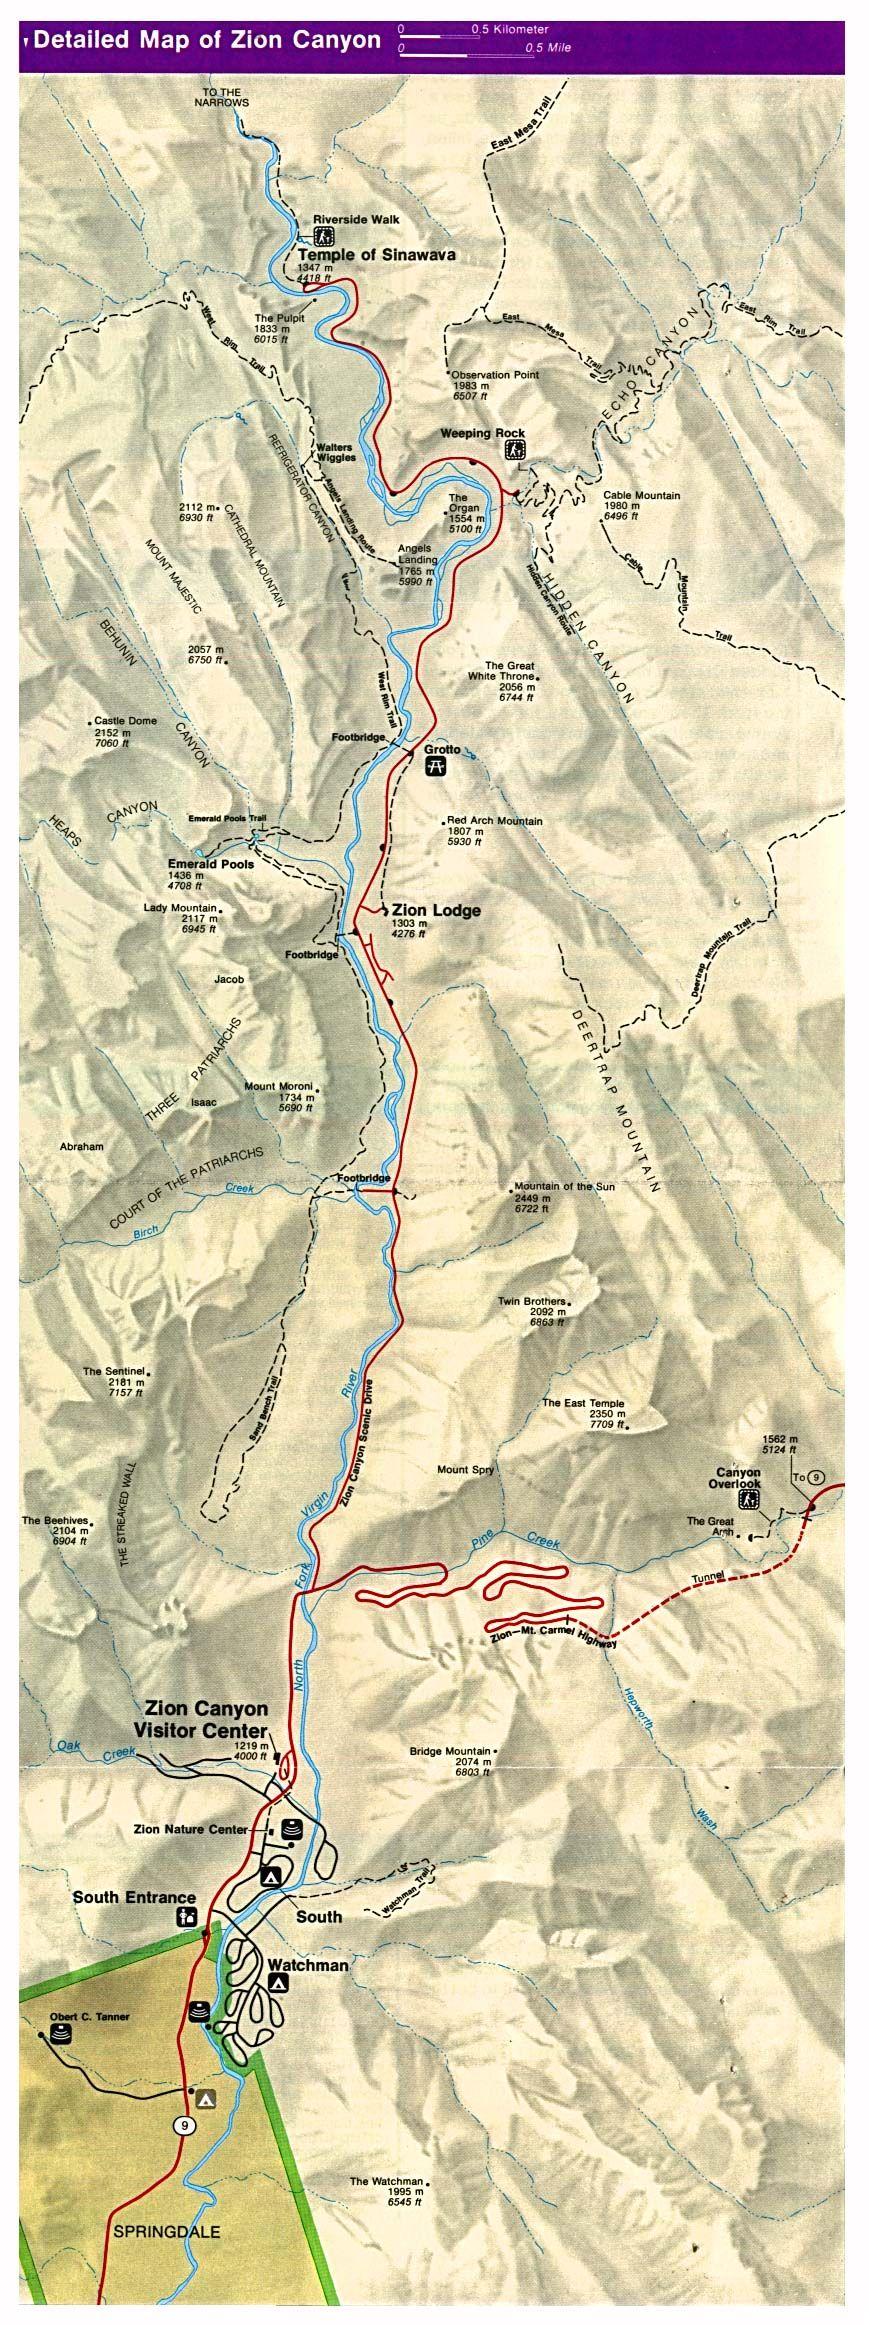 Zion Canyon Map Zion National Park UT USA mappery Utah